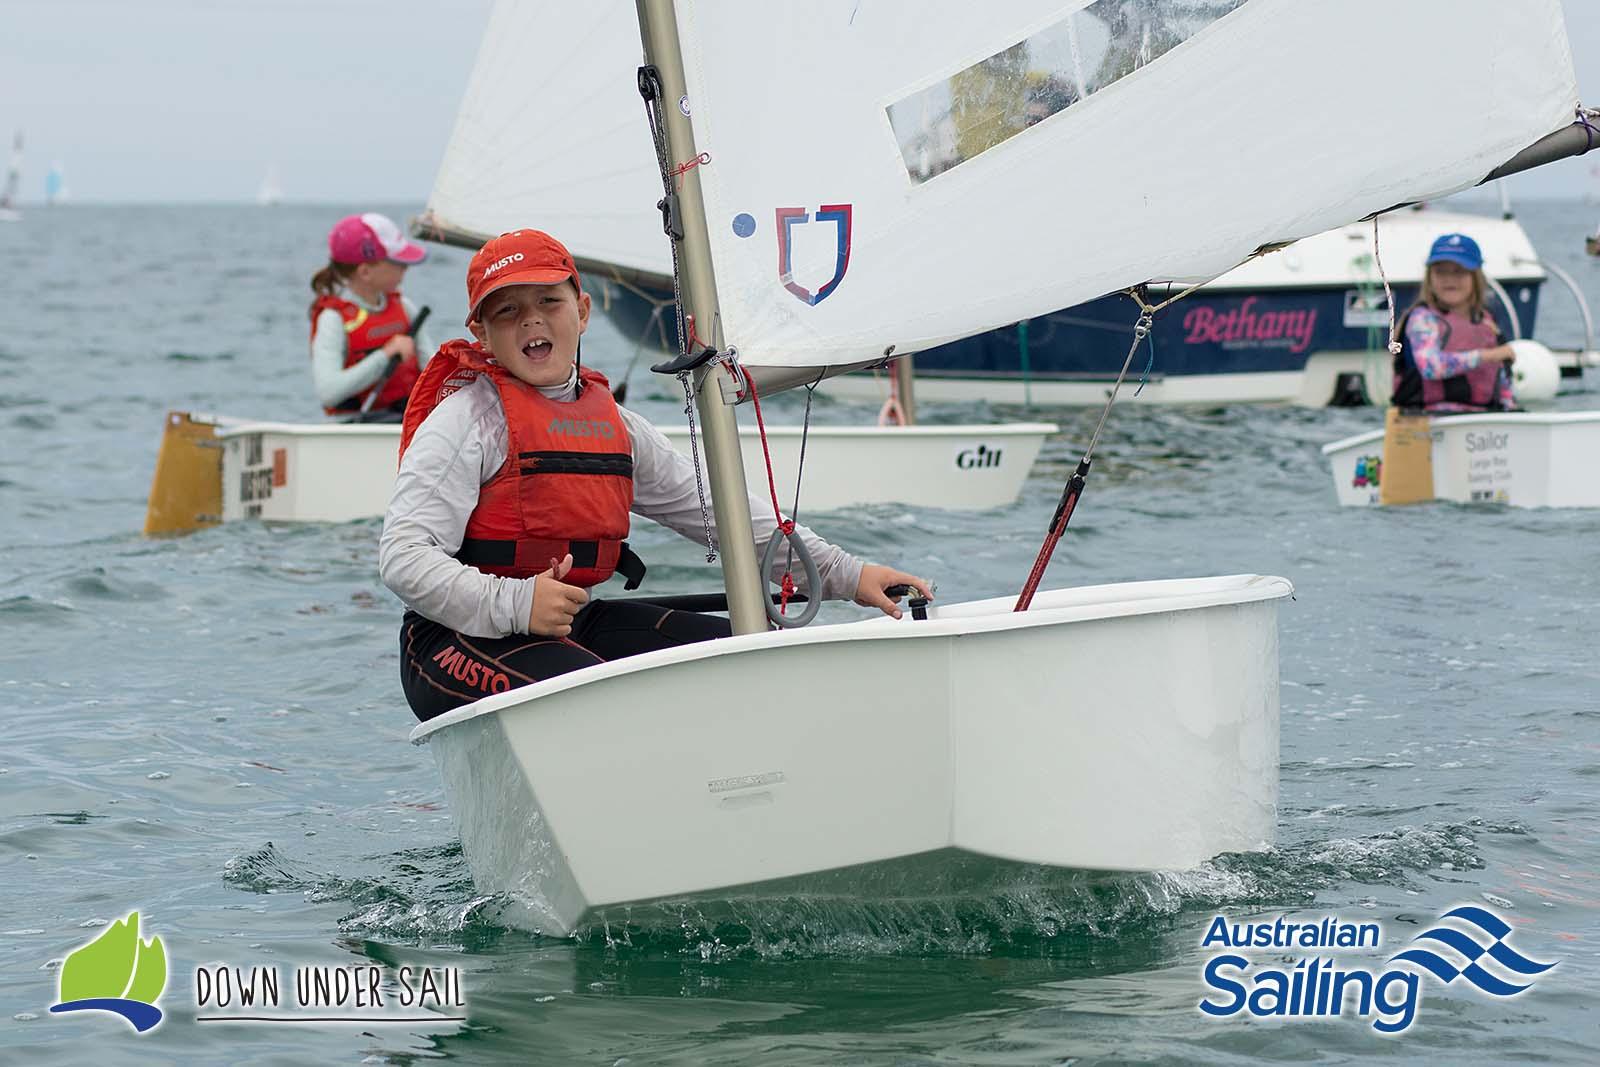 Fraser-Baker-participating-in-the-Optimist-green-fleet-last-year